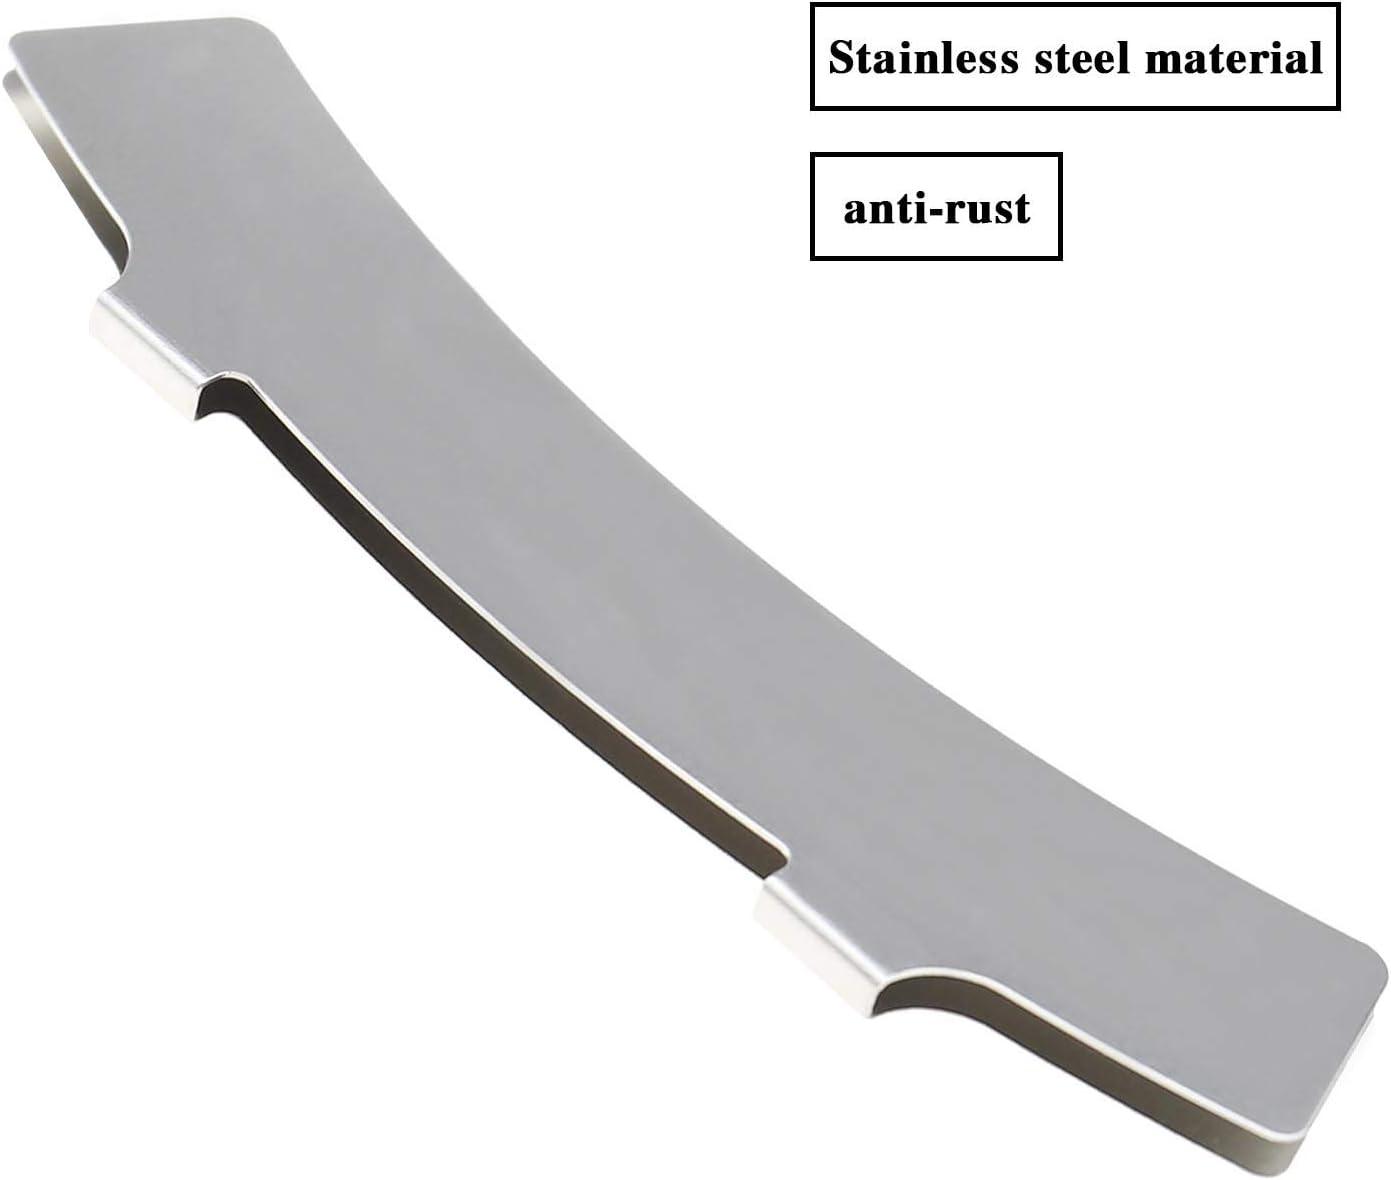 2 Pairs of Bike Arc Disc Brake Pads Gap Regulator Rotor Adjustment Alignment Tool Stainless Steel for MTB Mountain Bike